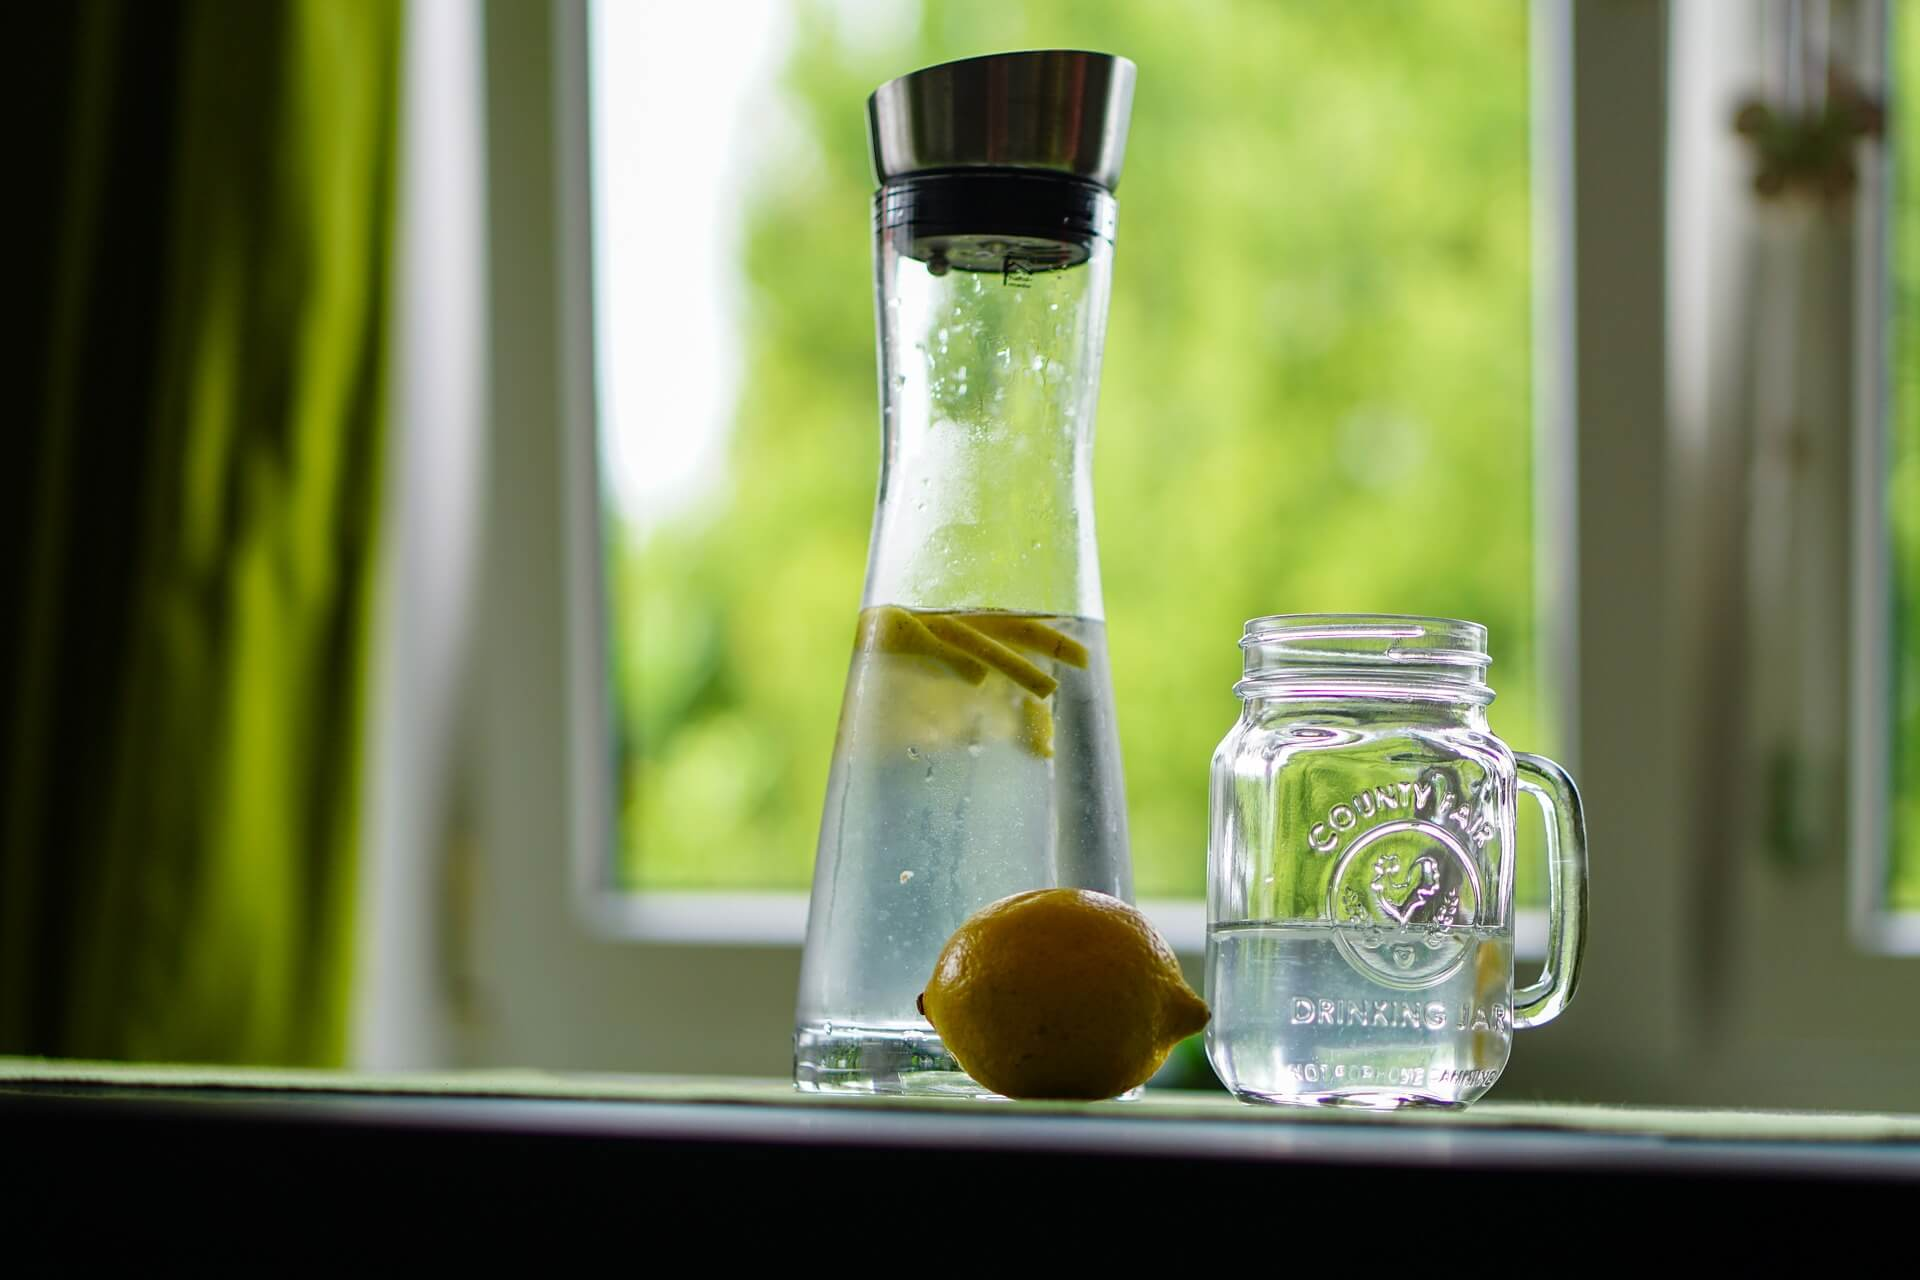 Ans Trinken denken - gespritztes Wasser (c) kira_fotografie / pixabay.de